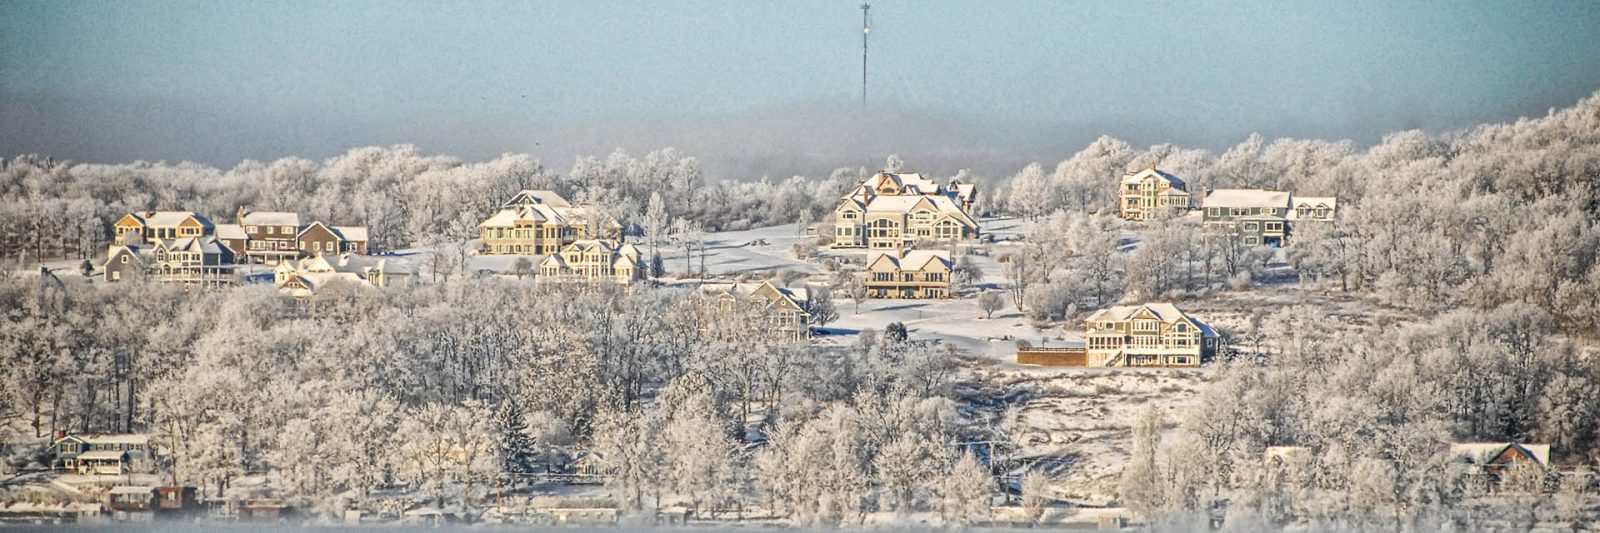 Canandaigua Lake in winter